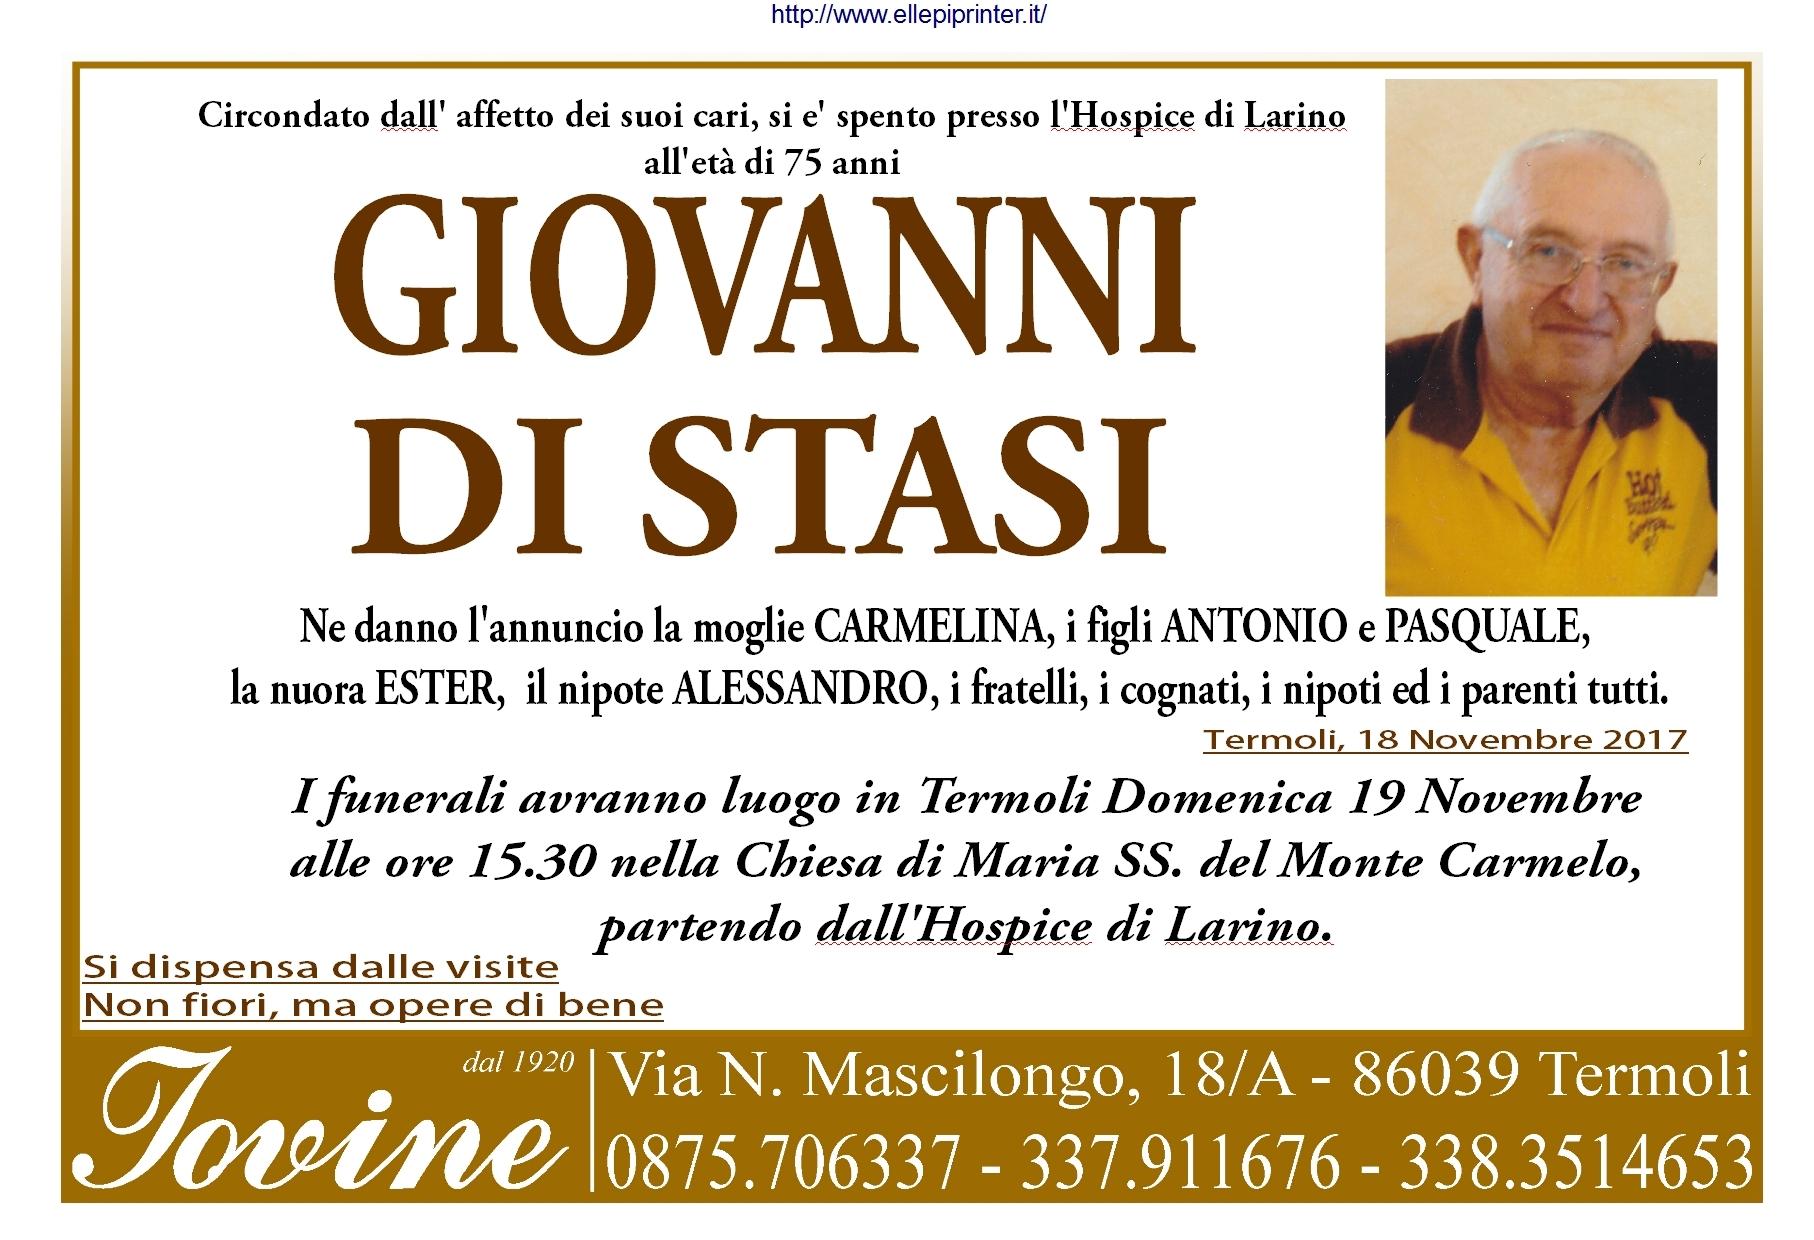 Giovanni Di Stasi, 18/11/2017, Termoli – Onoranze Funebri Iovine